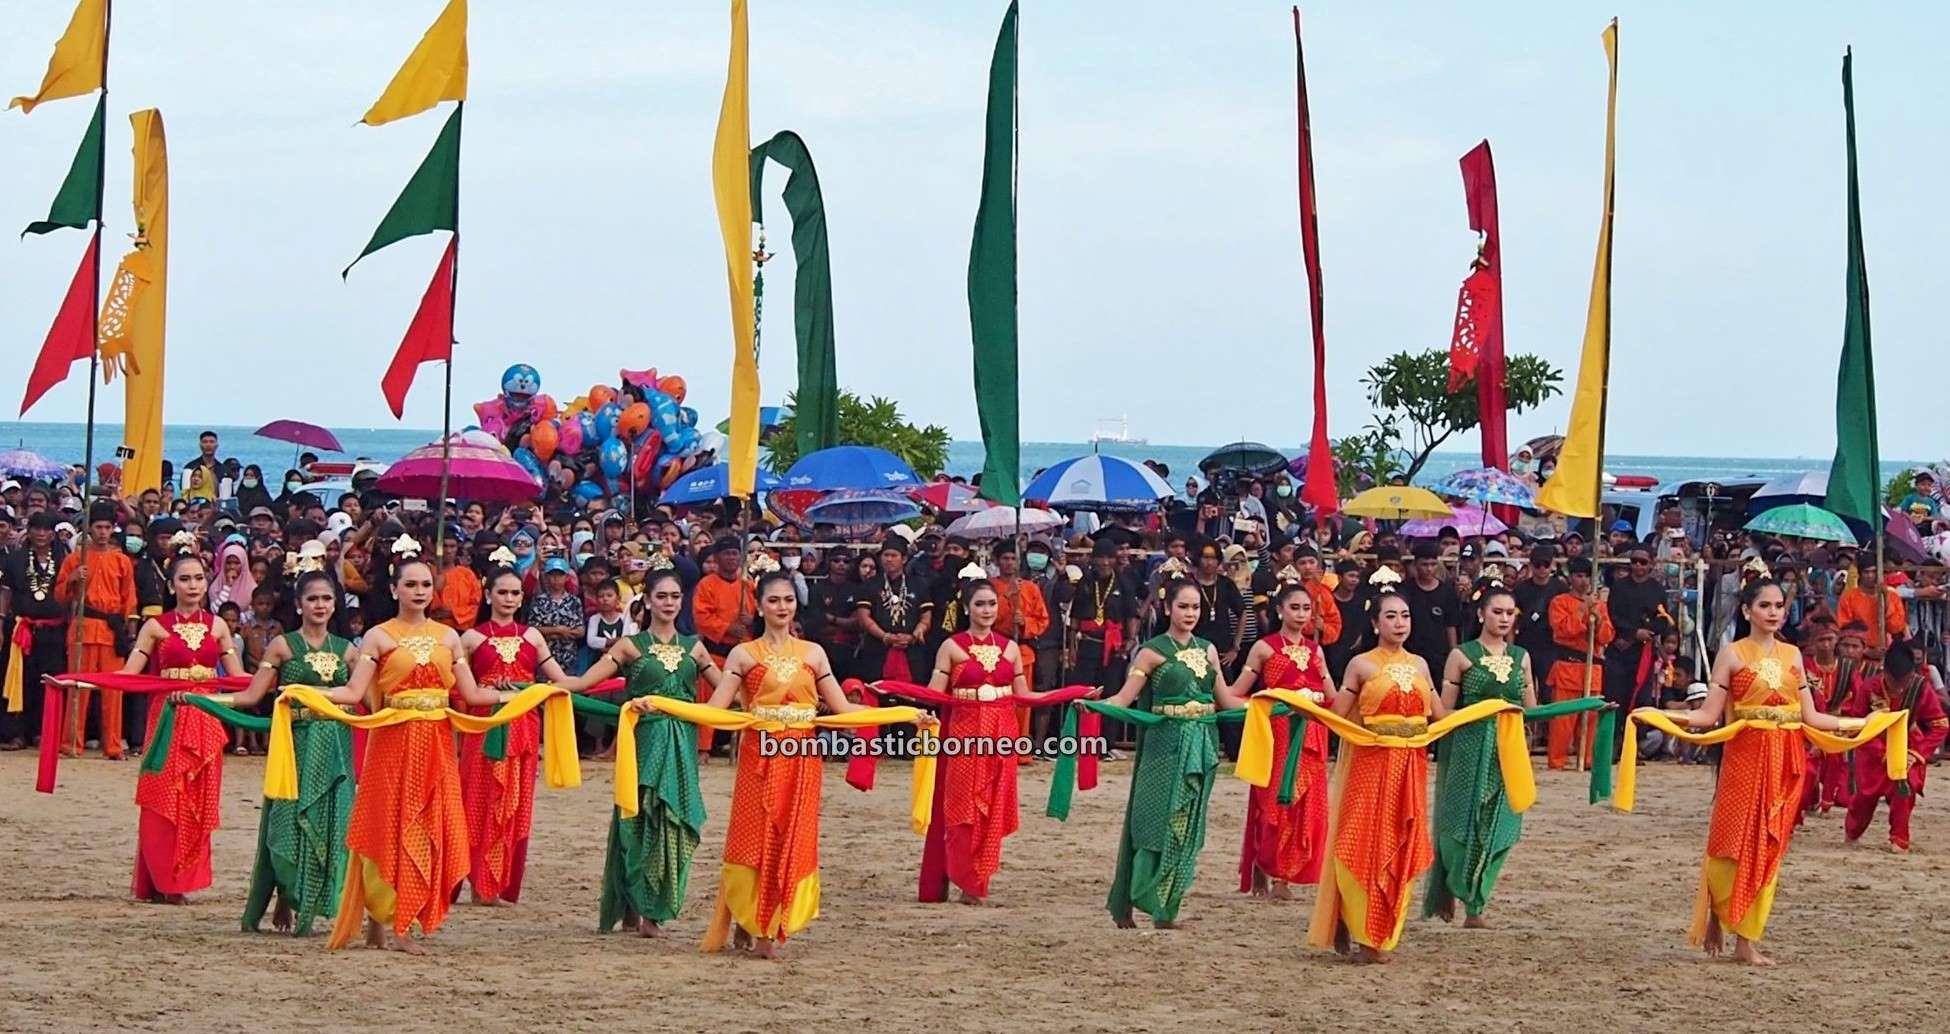 Suku Dayak Tidung, upacara adat, authentic, indigenous, culture, event, native, tribe, Kalimantan Utara, Pariwisata, travel guide, Borneo, 婆罗洲北加里曼丹, 打拉根岛旅游景点, 印尼原住民传统文化